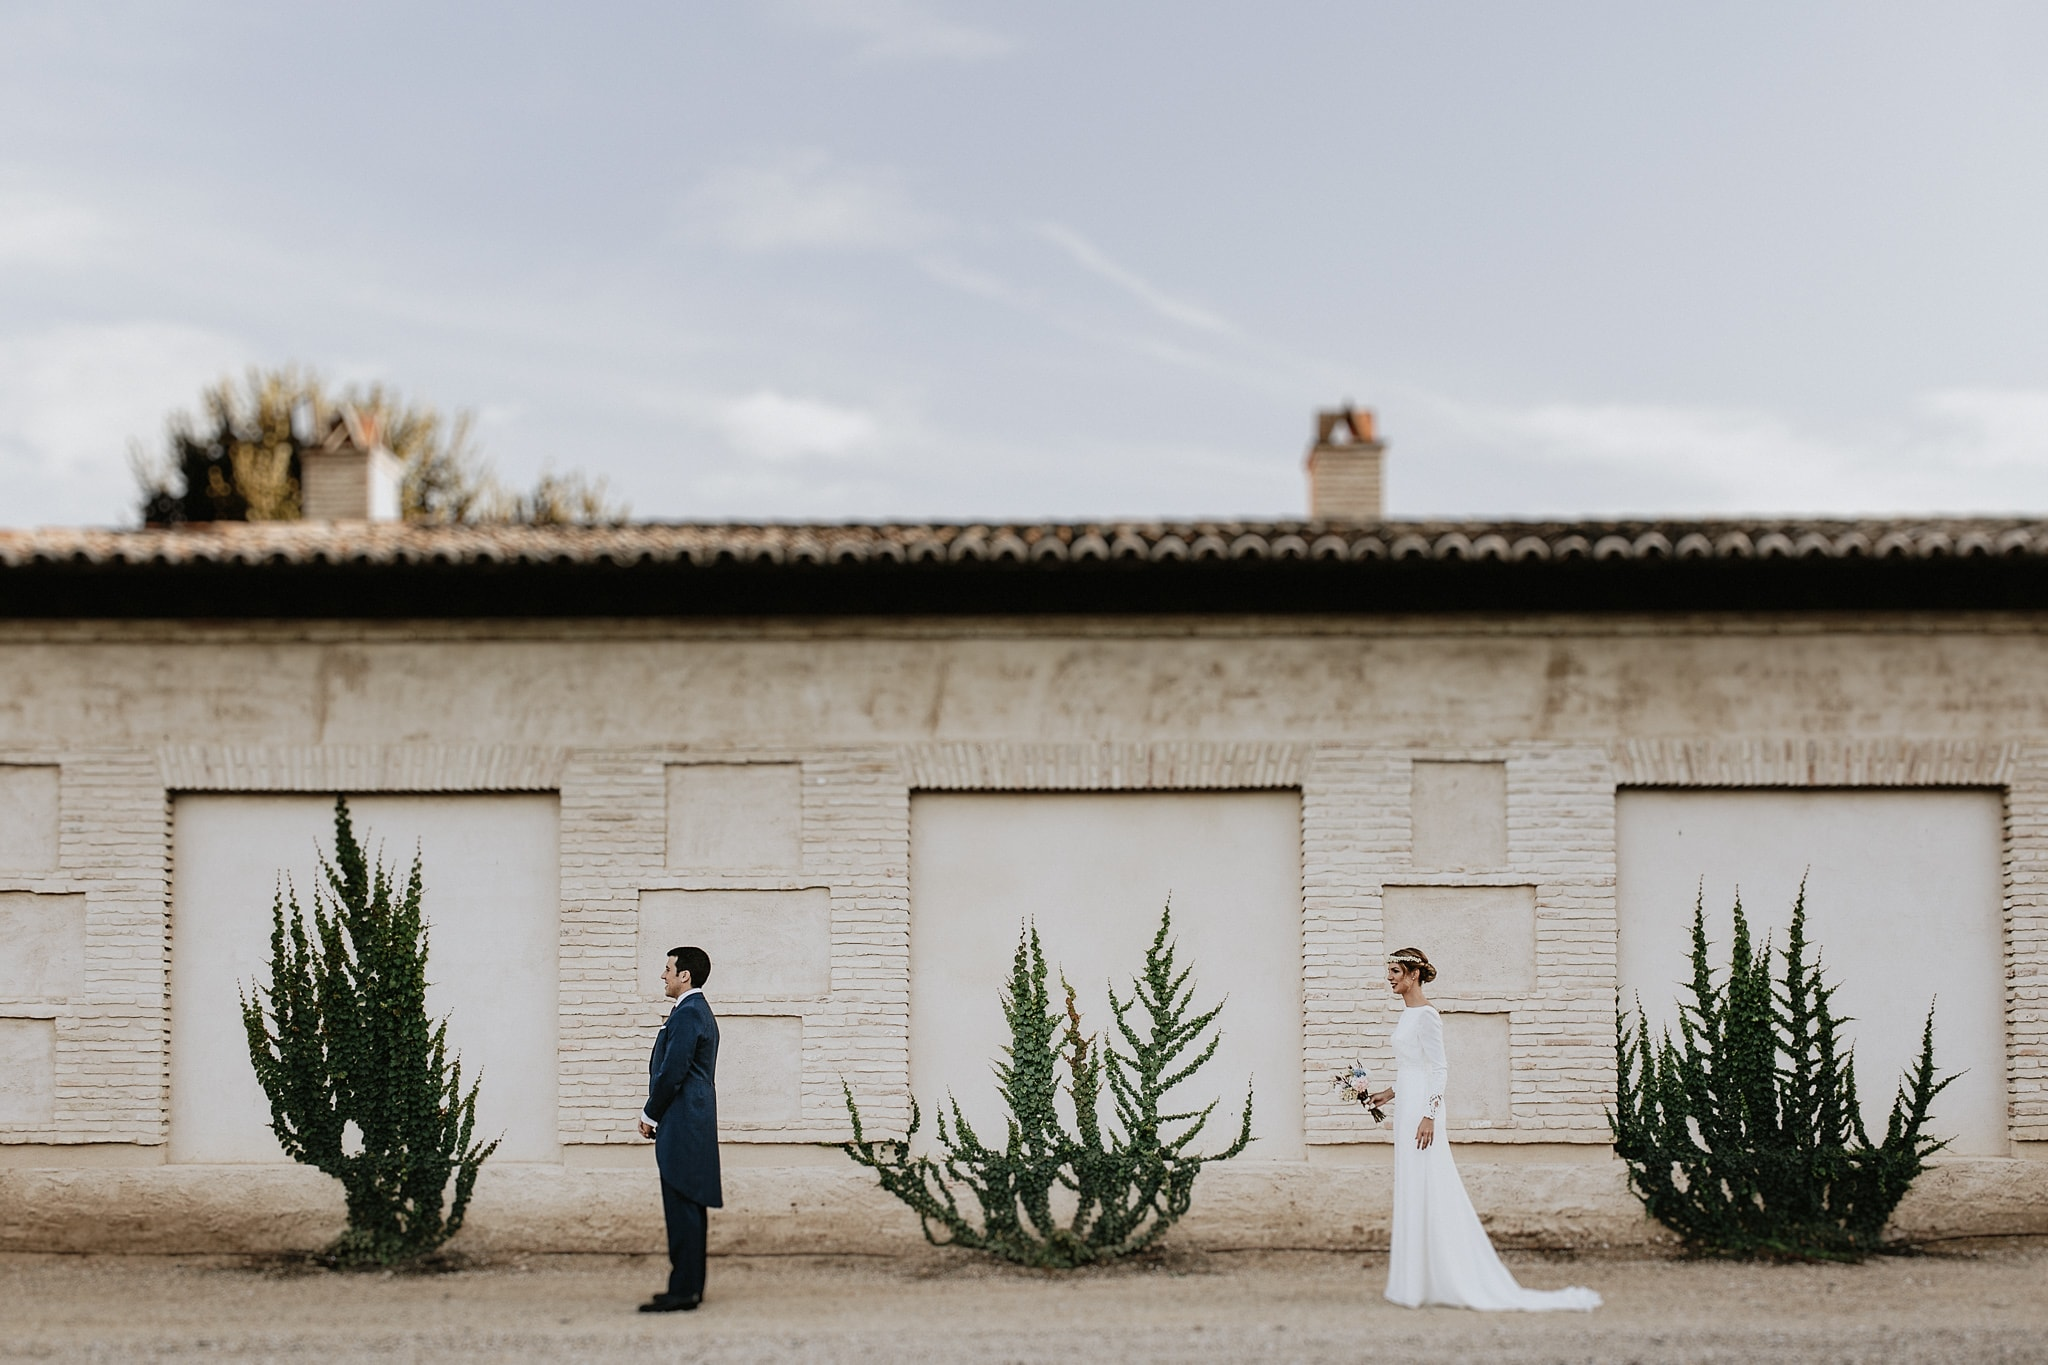 prisma-blanco-fotografos-bodas-toledo-61